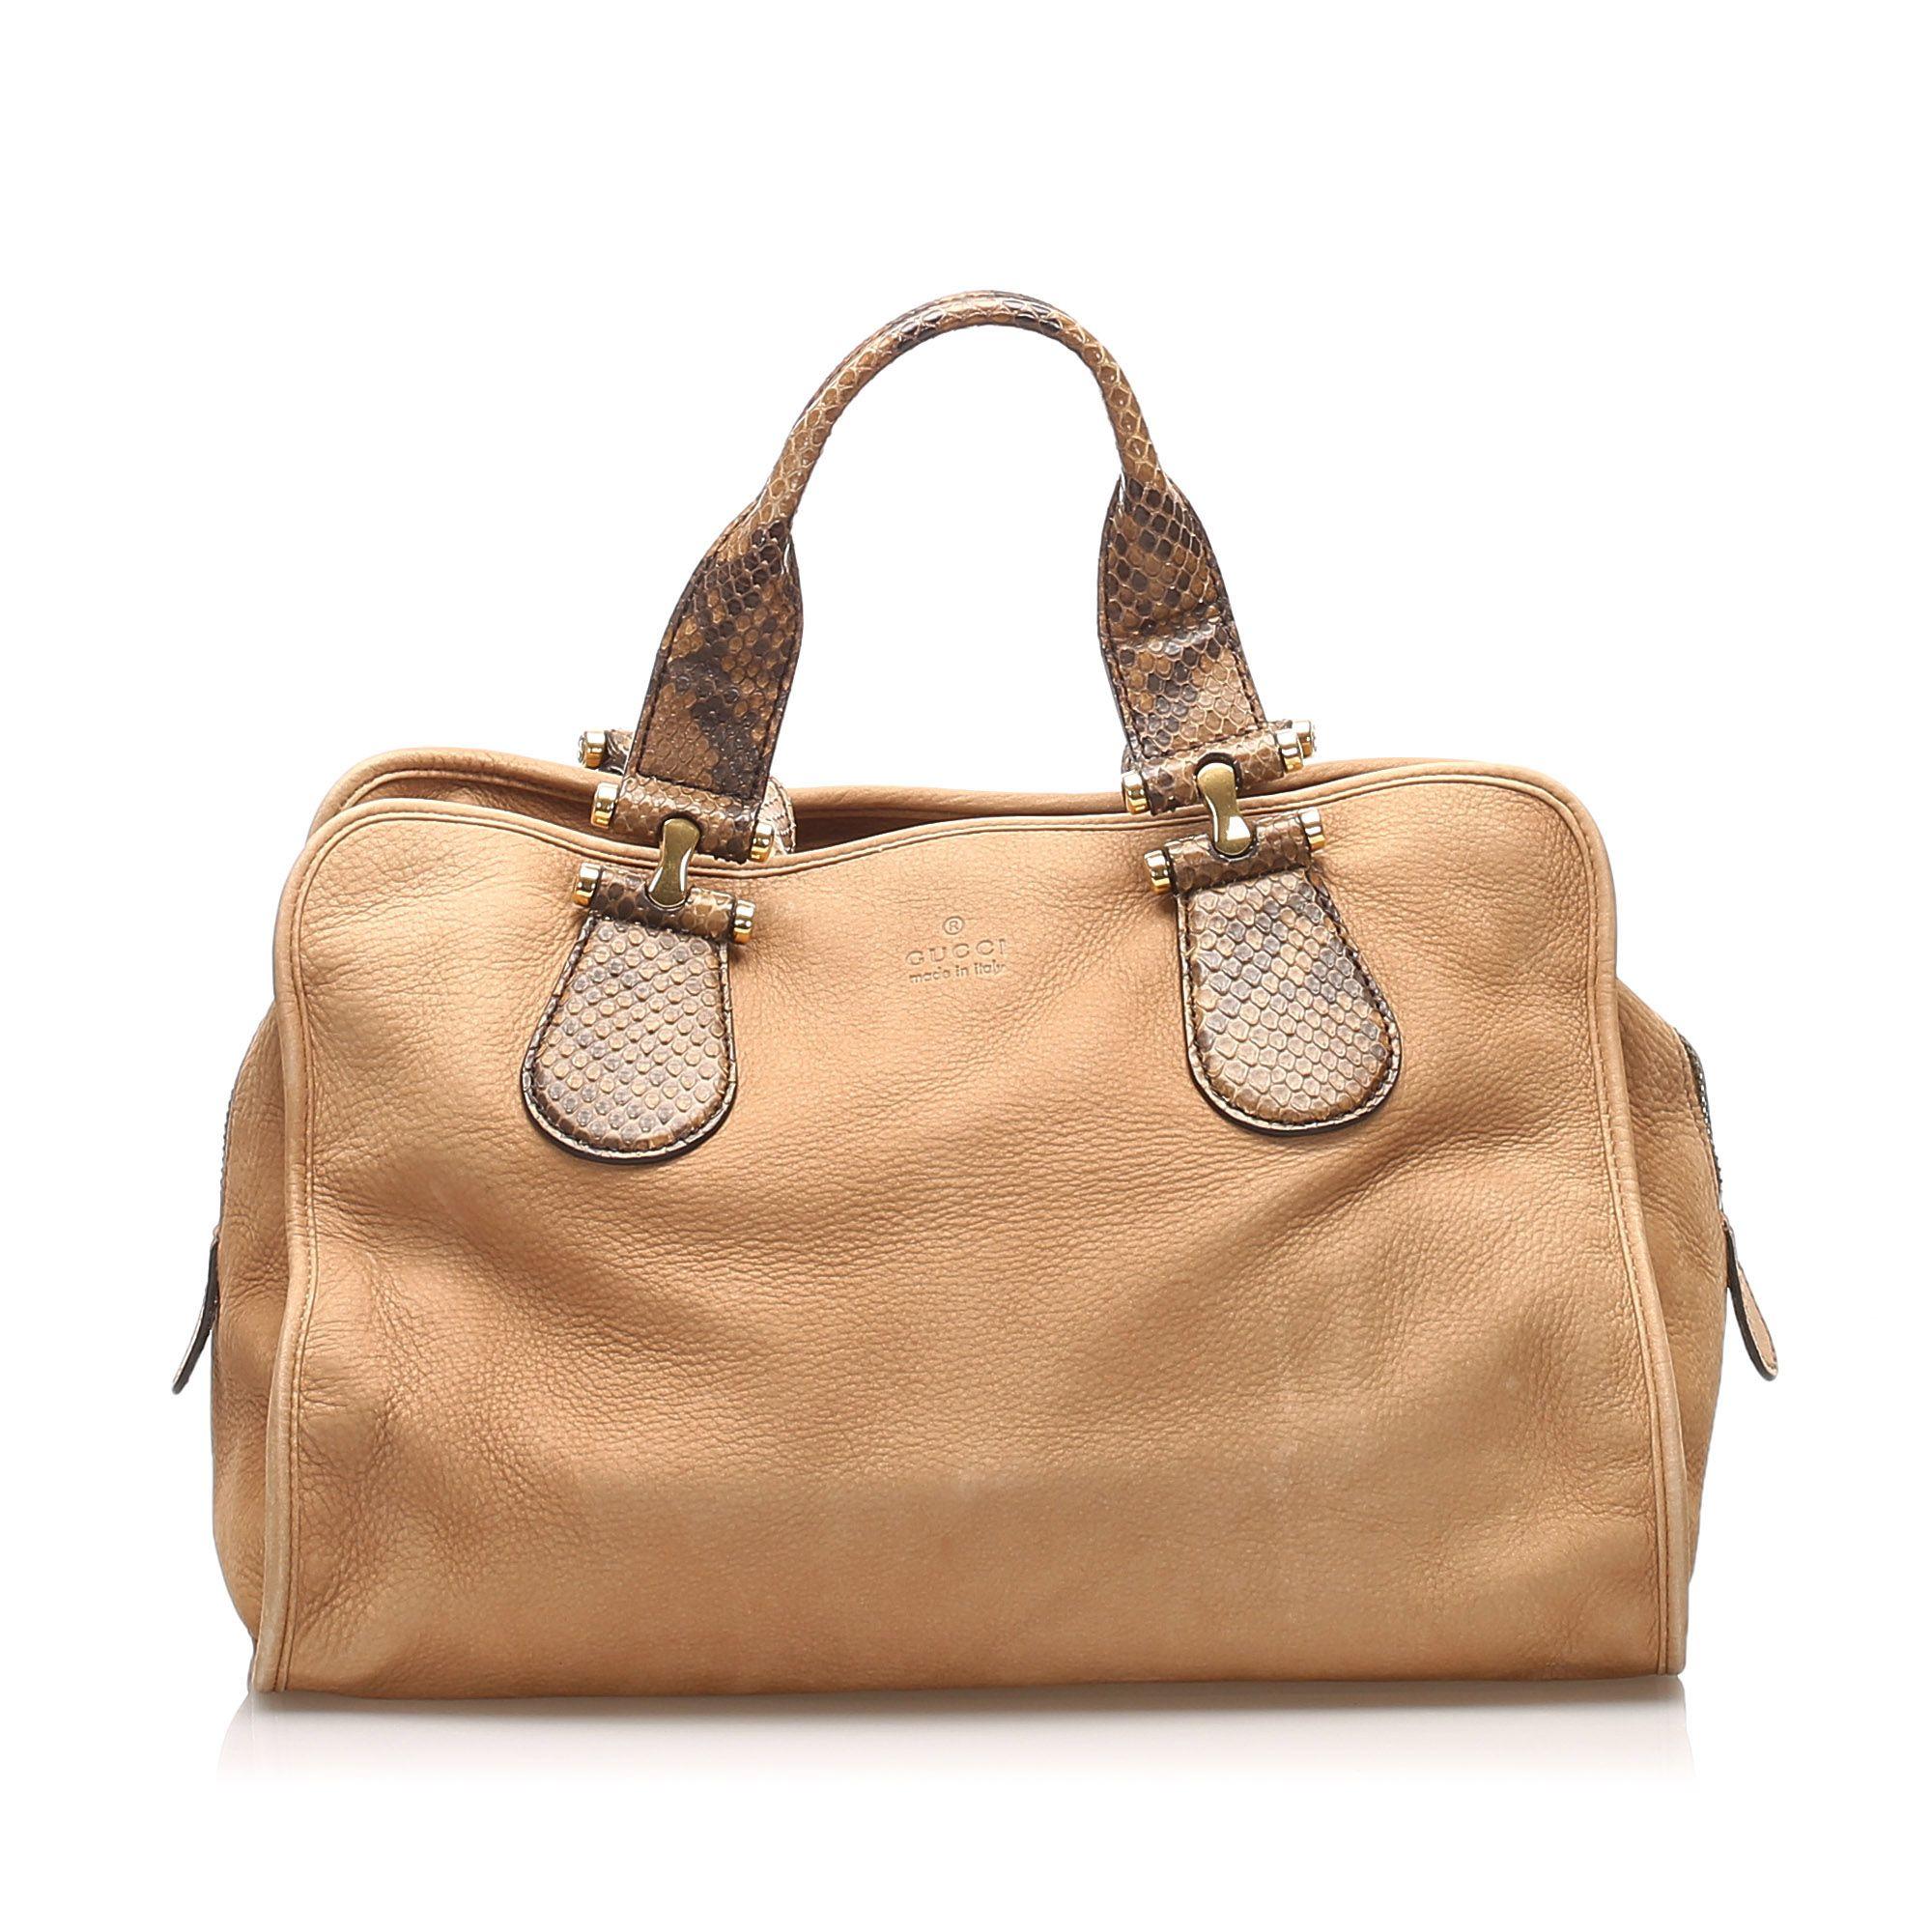 Vintage Gucci Twice Nubuck Leather Handbag Brown